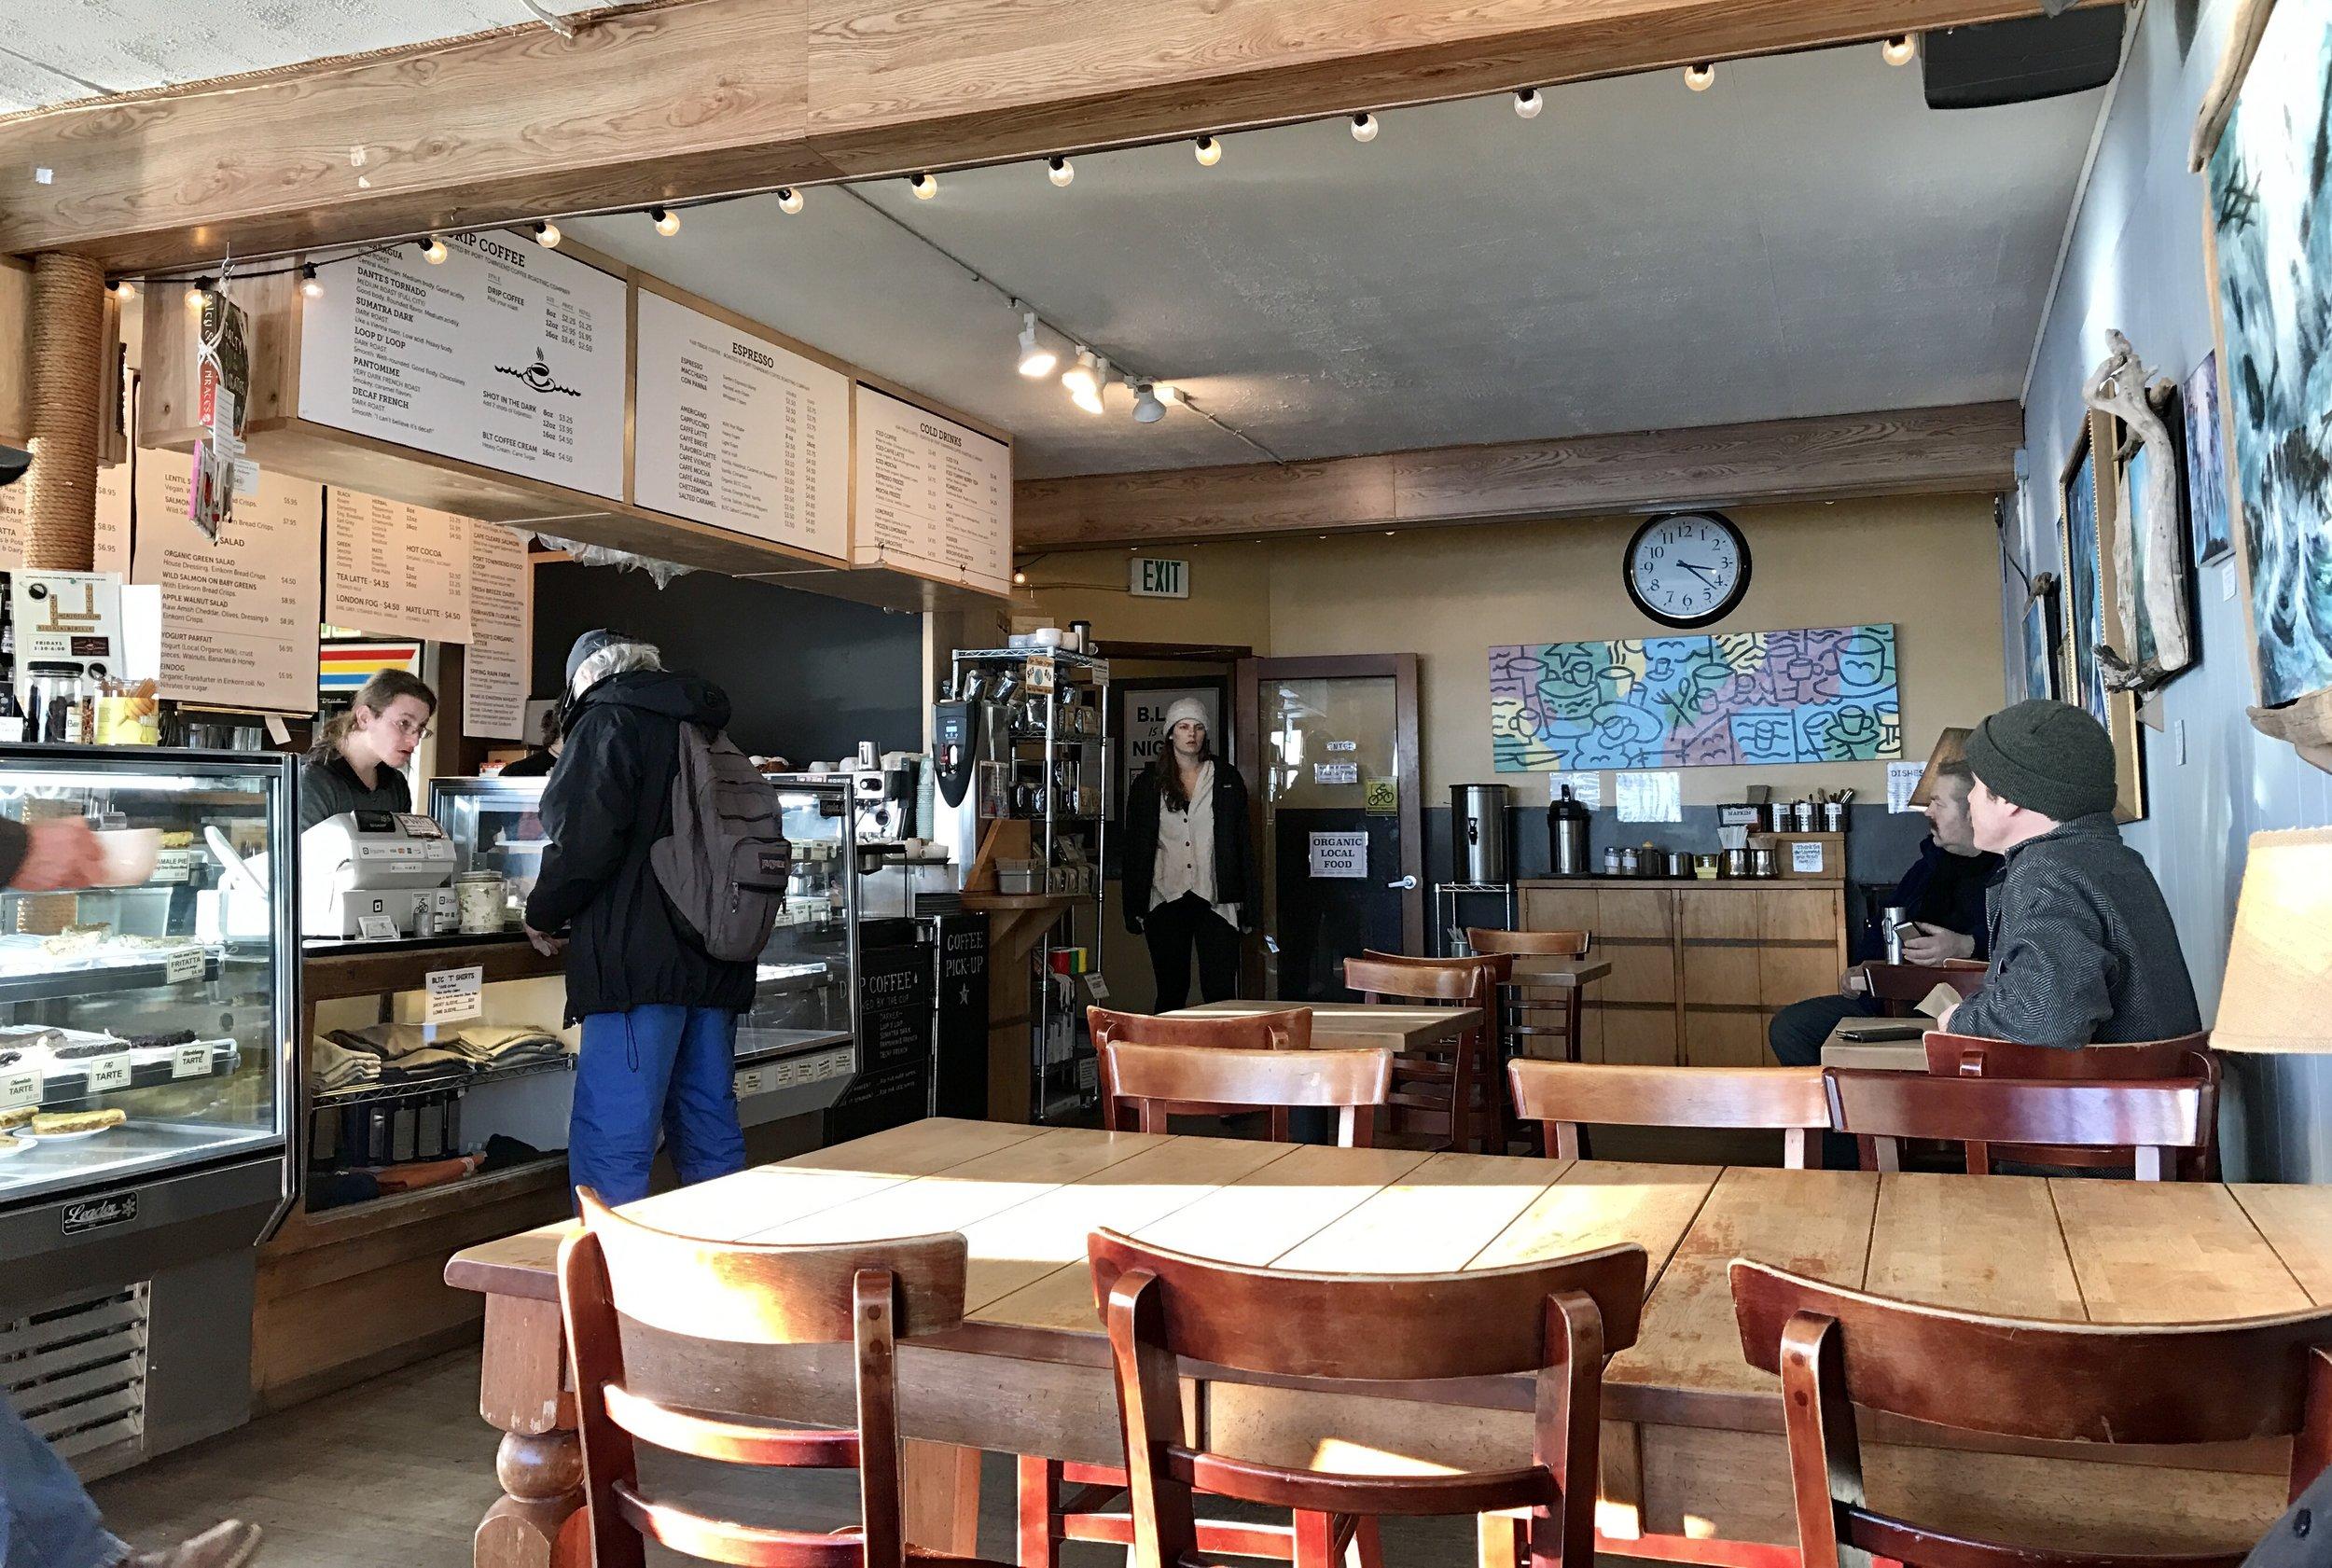 Inside Better Living Through Coffee